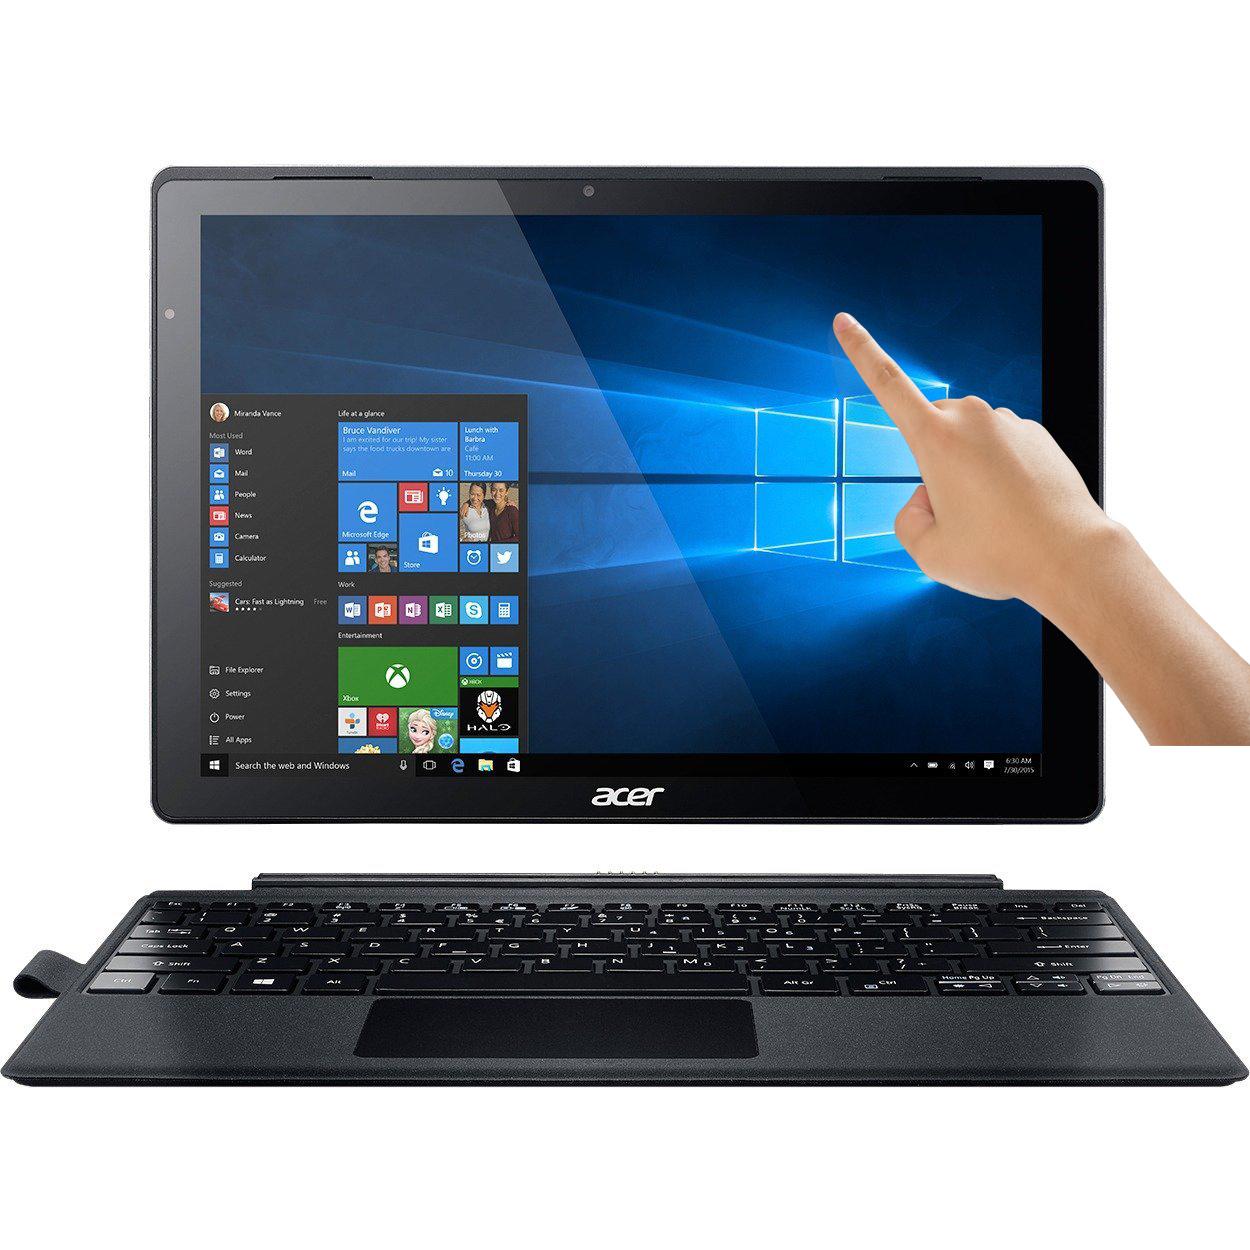 Acer Aspire Switch Alpha 12 Touch Core i5-6200U Dual-Core...